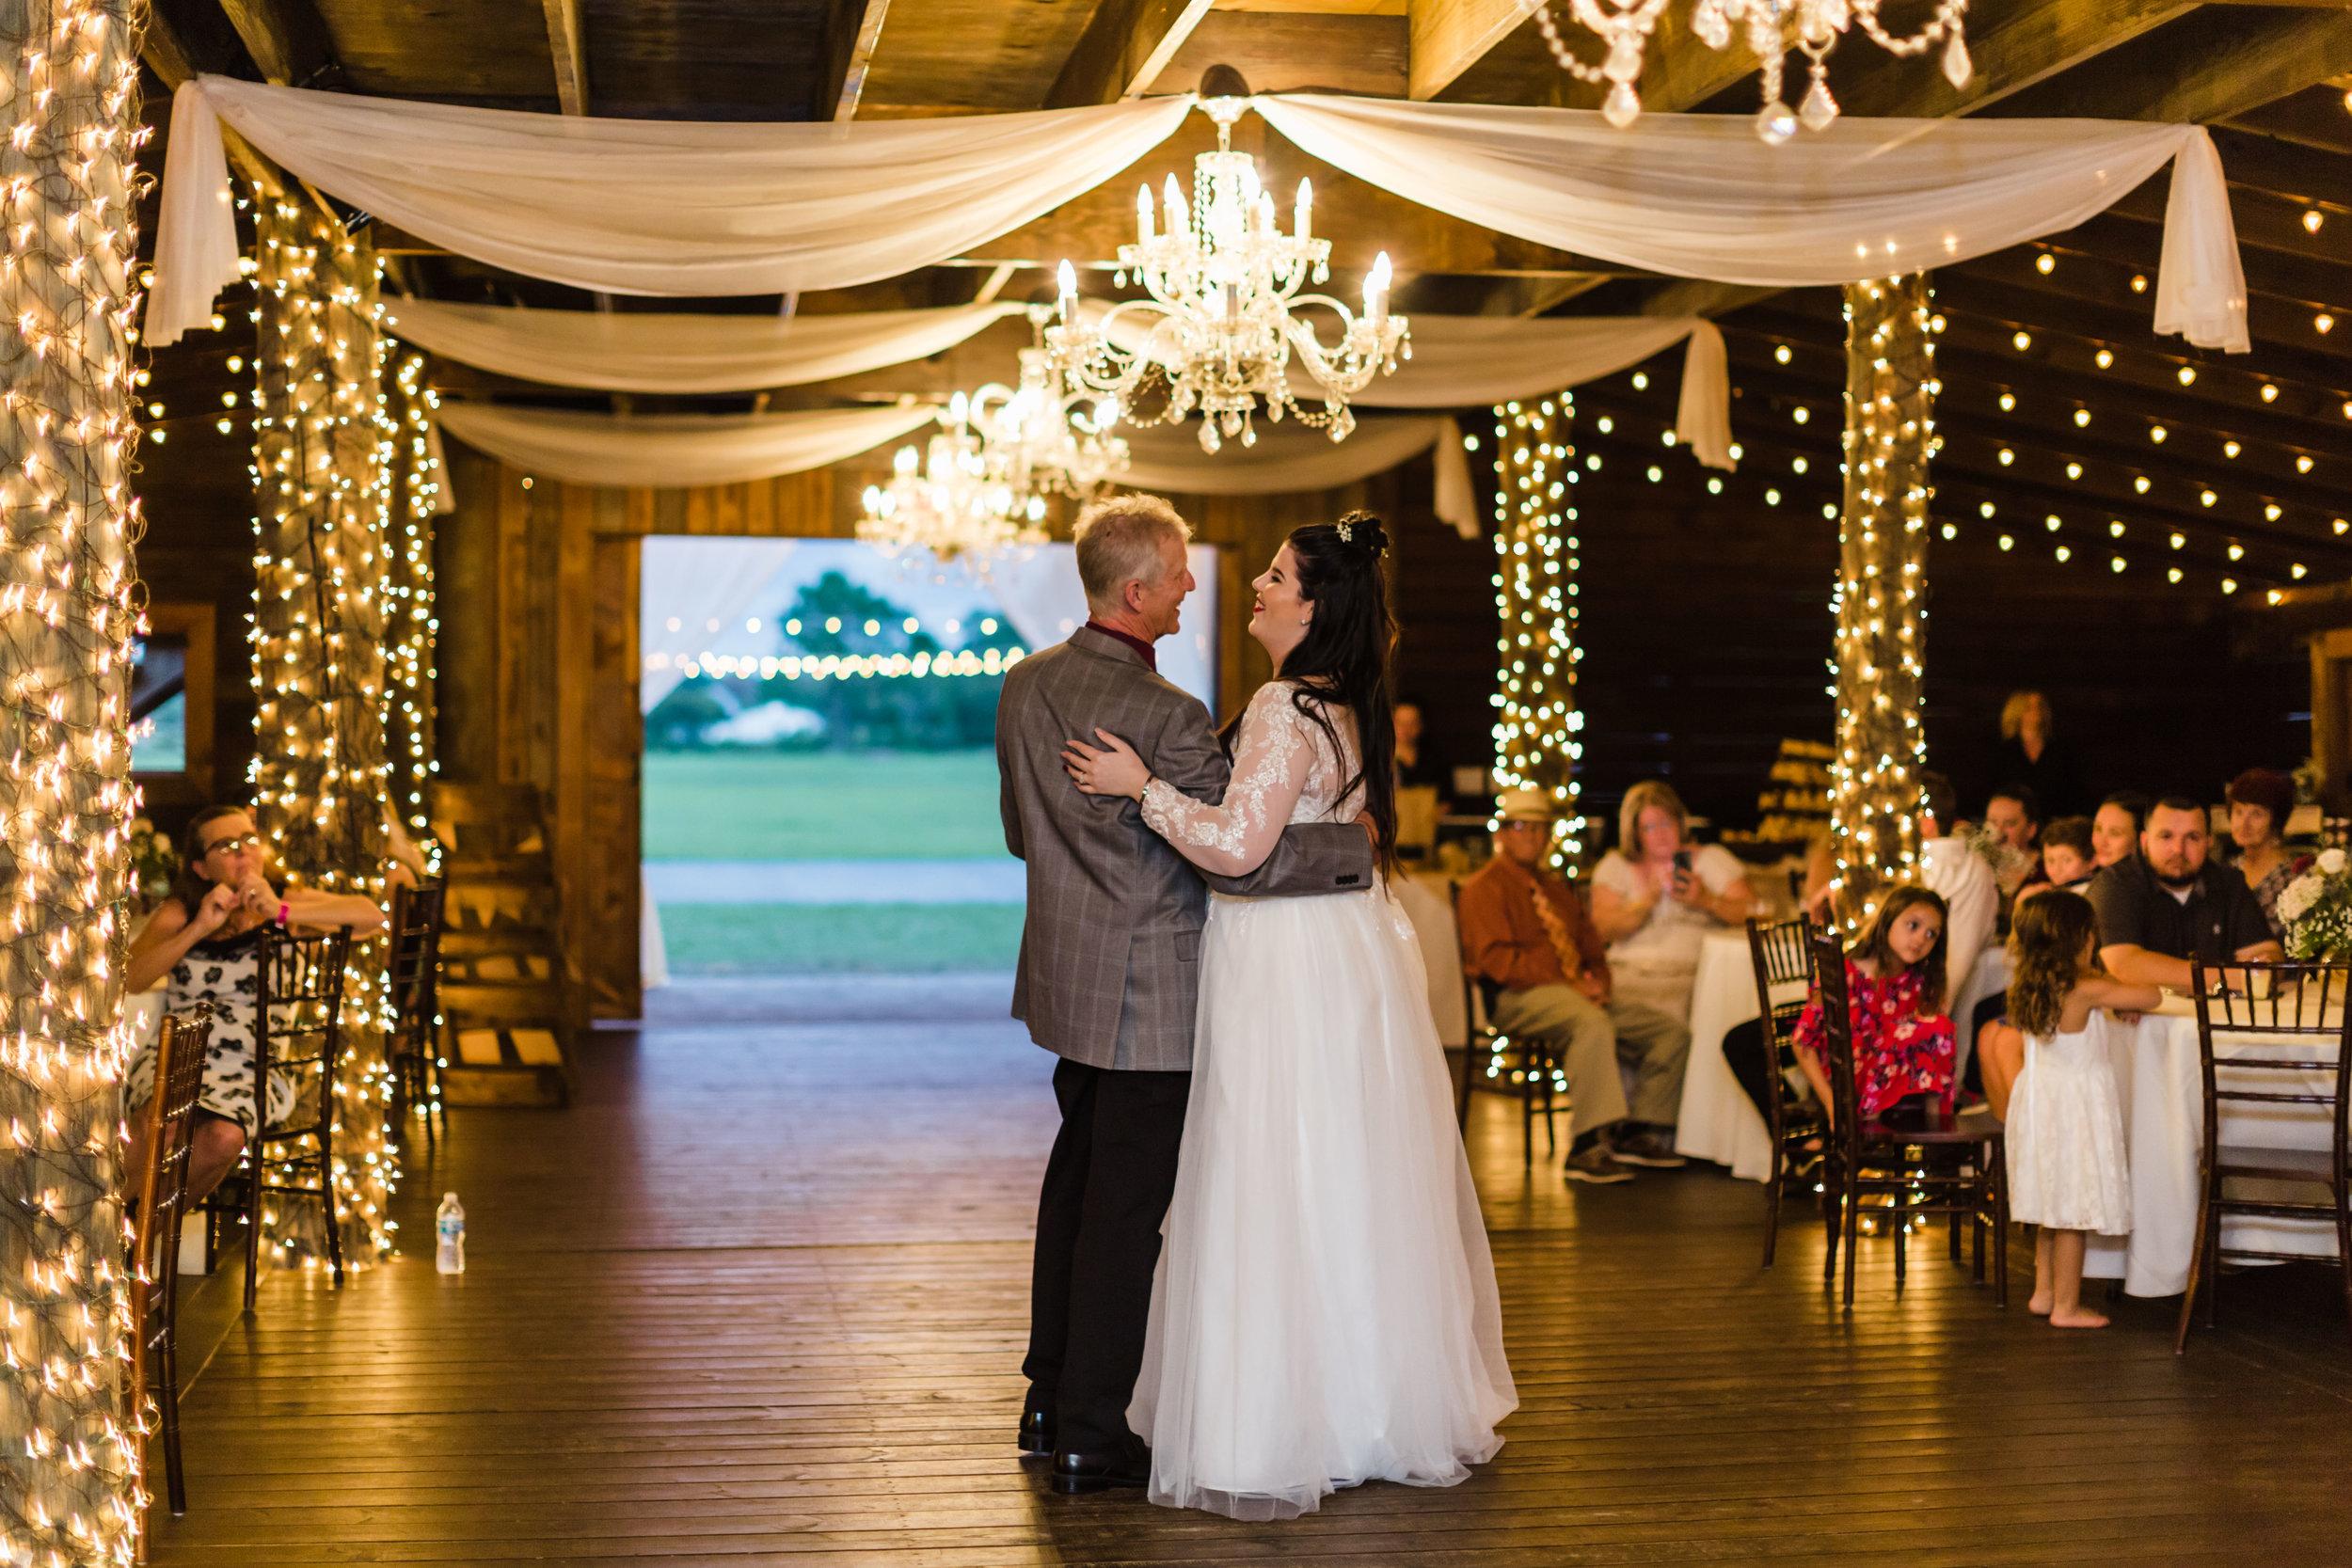 2018.11.11 Paige and TJ Enchanting Barn Wedding (574 of 841).jpg